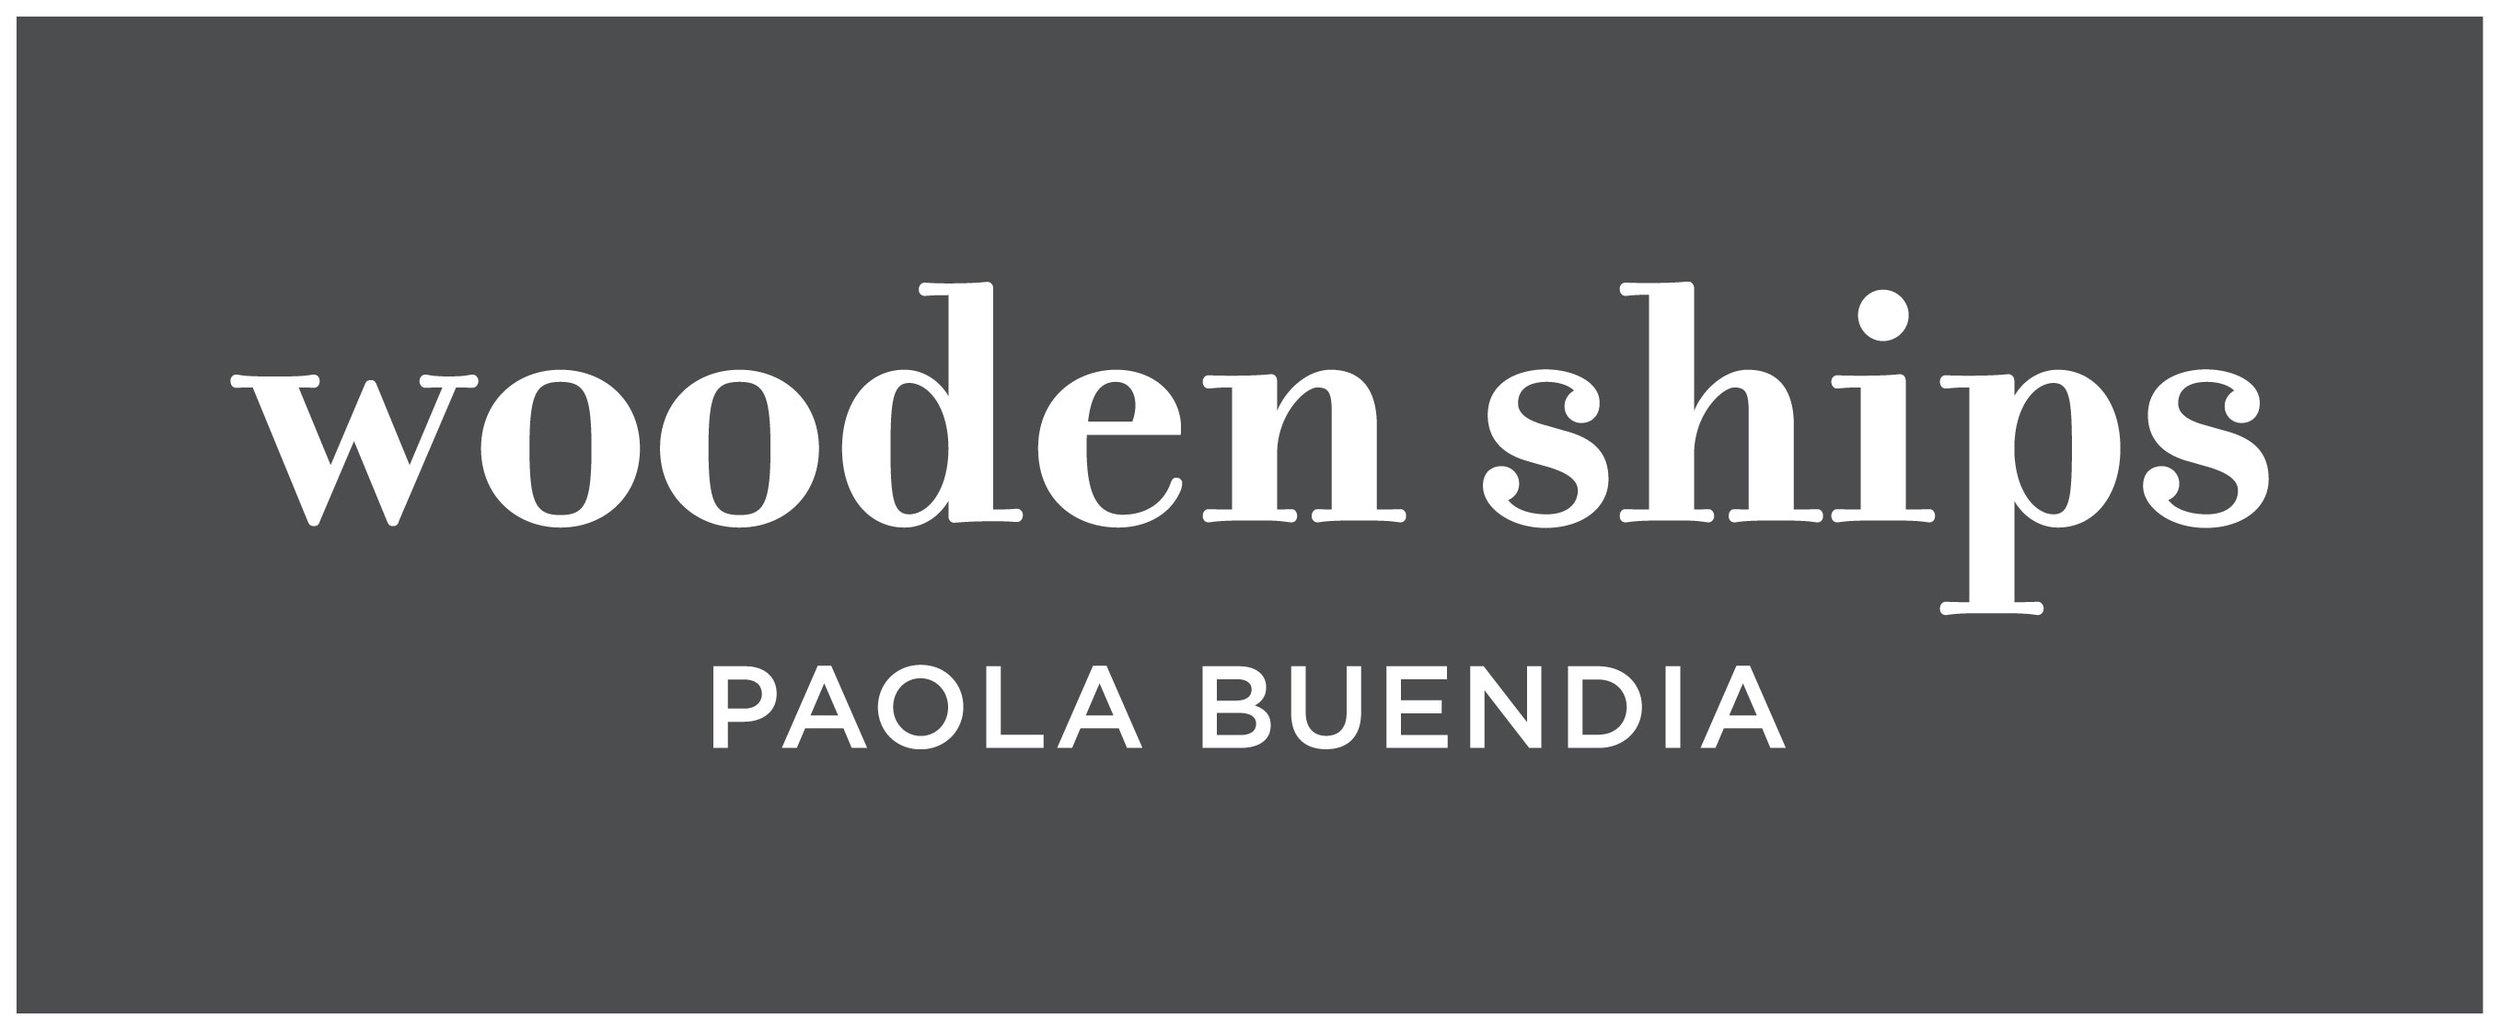 LOGO-WOODEN-SHIPS.jpg